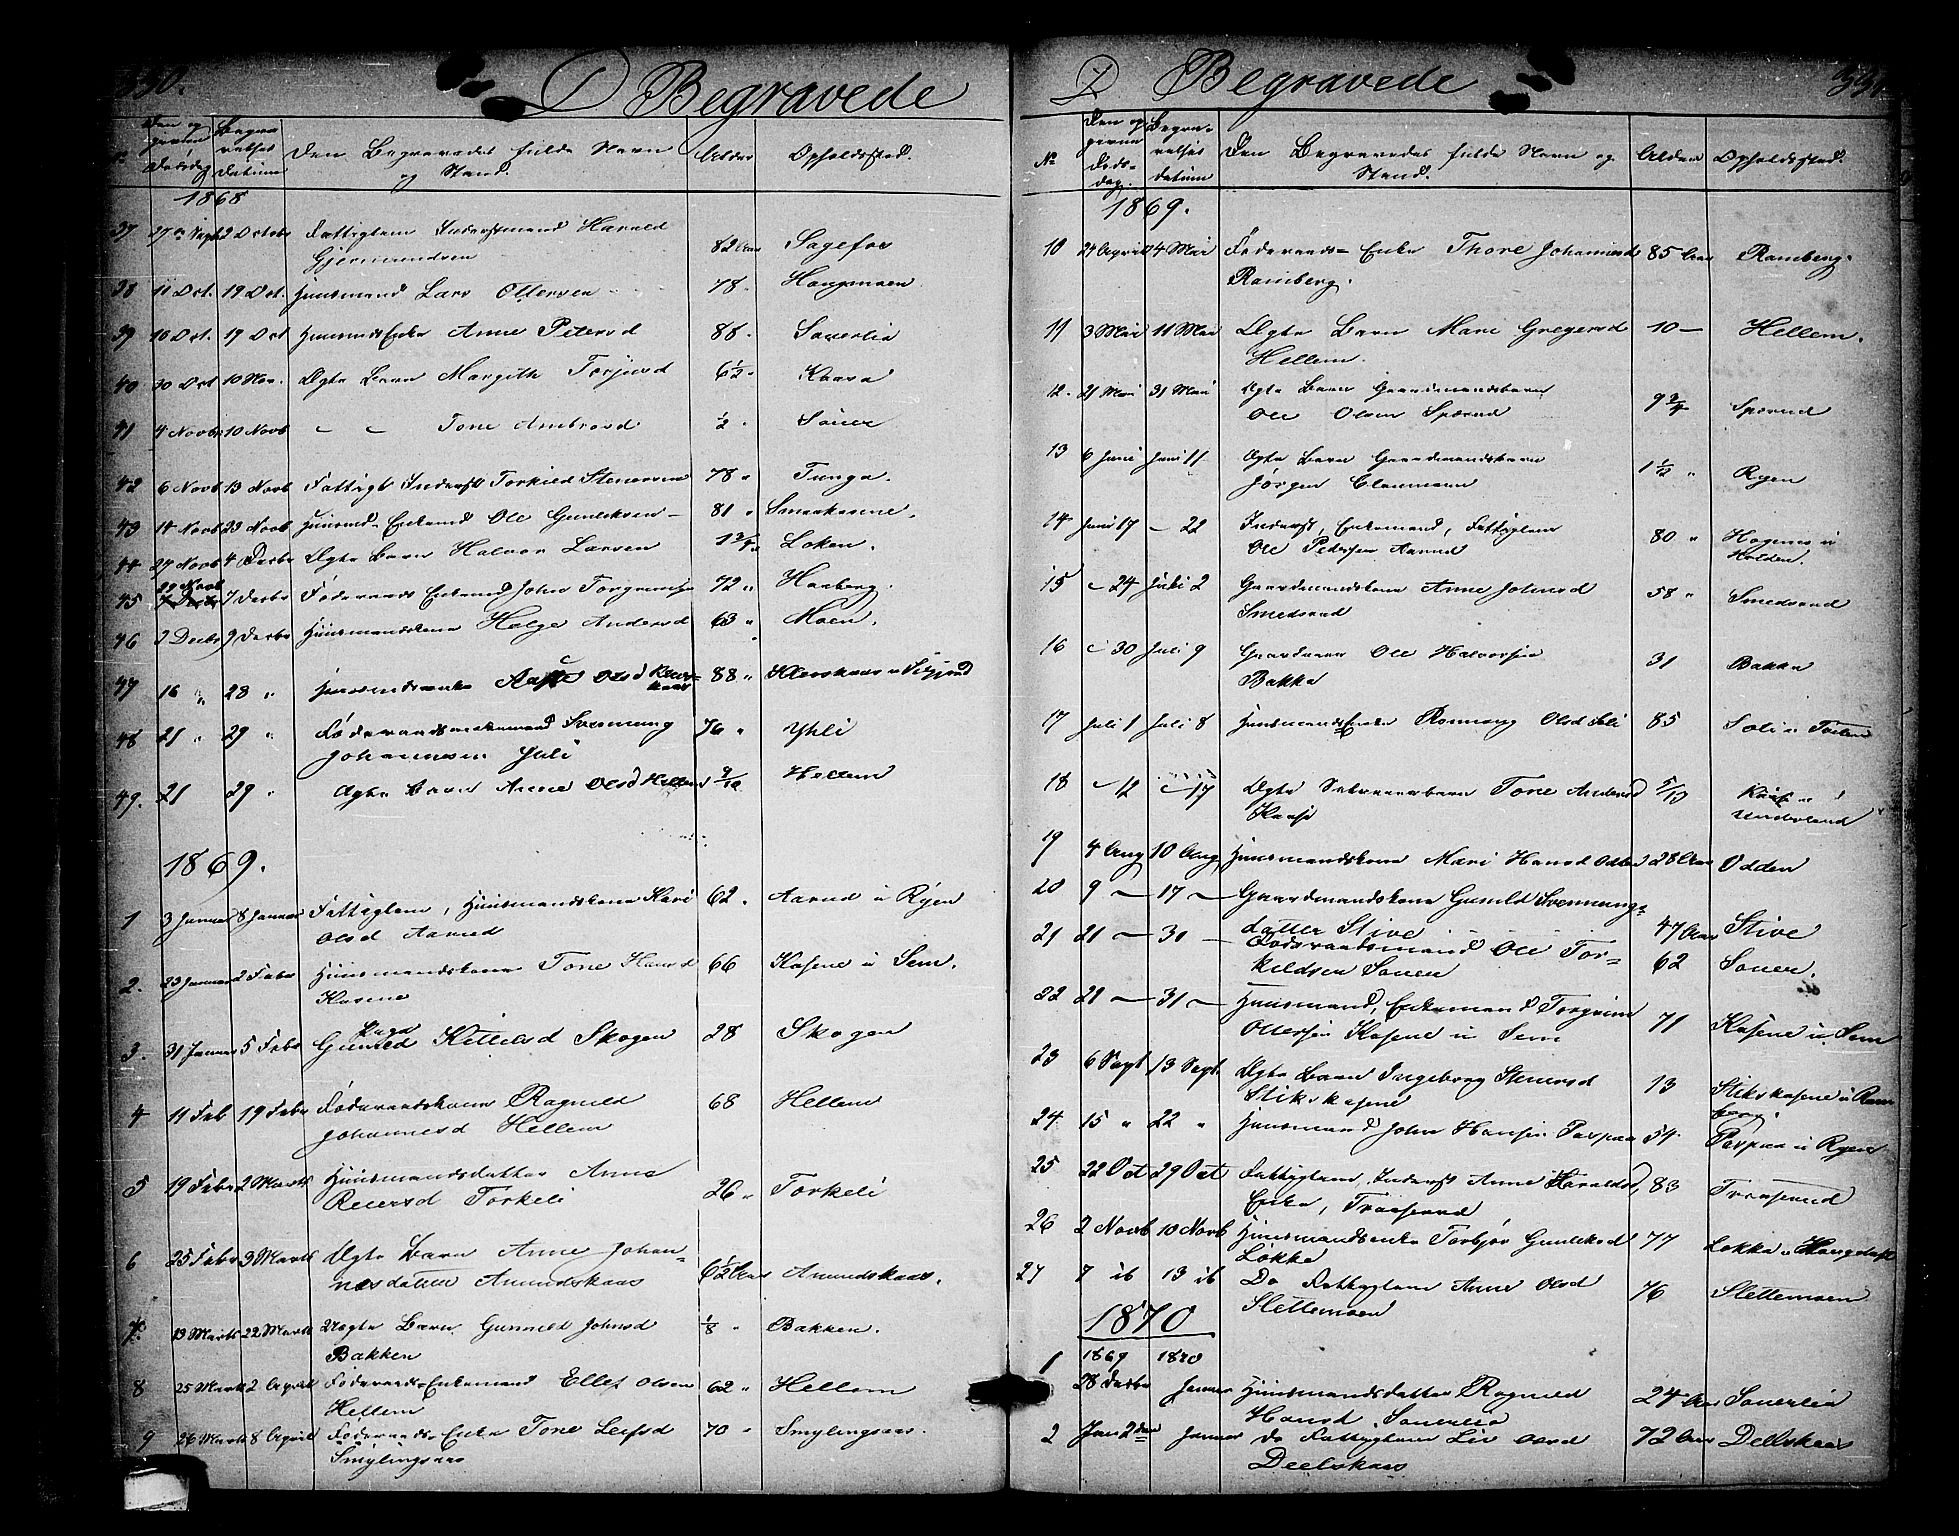 SAKO, Heddal kirkebøker, G/Ga/L0001: Klokkerbok nr. I 1, 1866-1878, s. 330-331